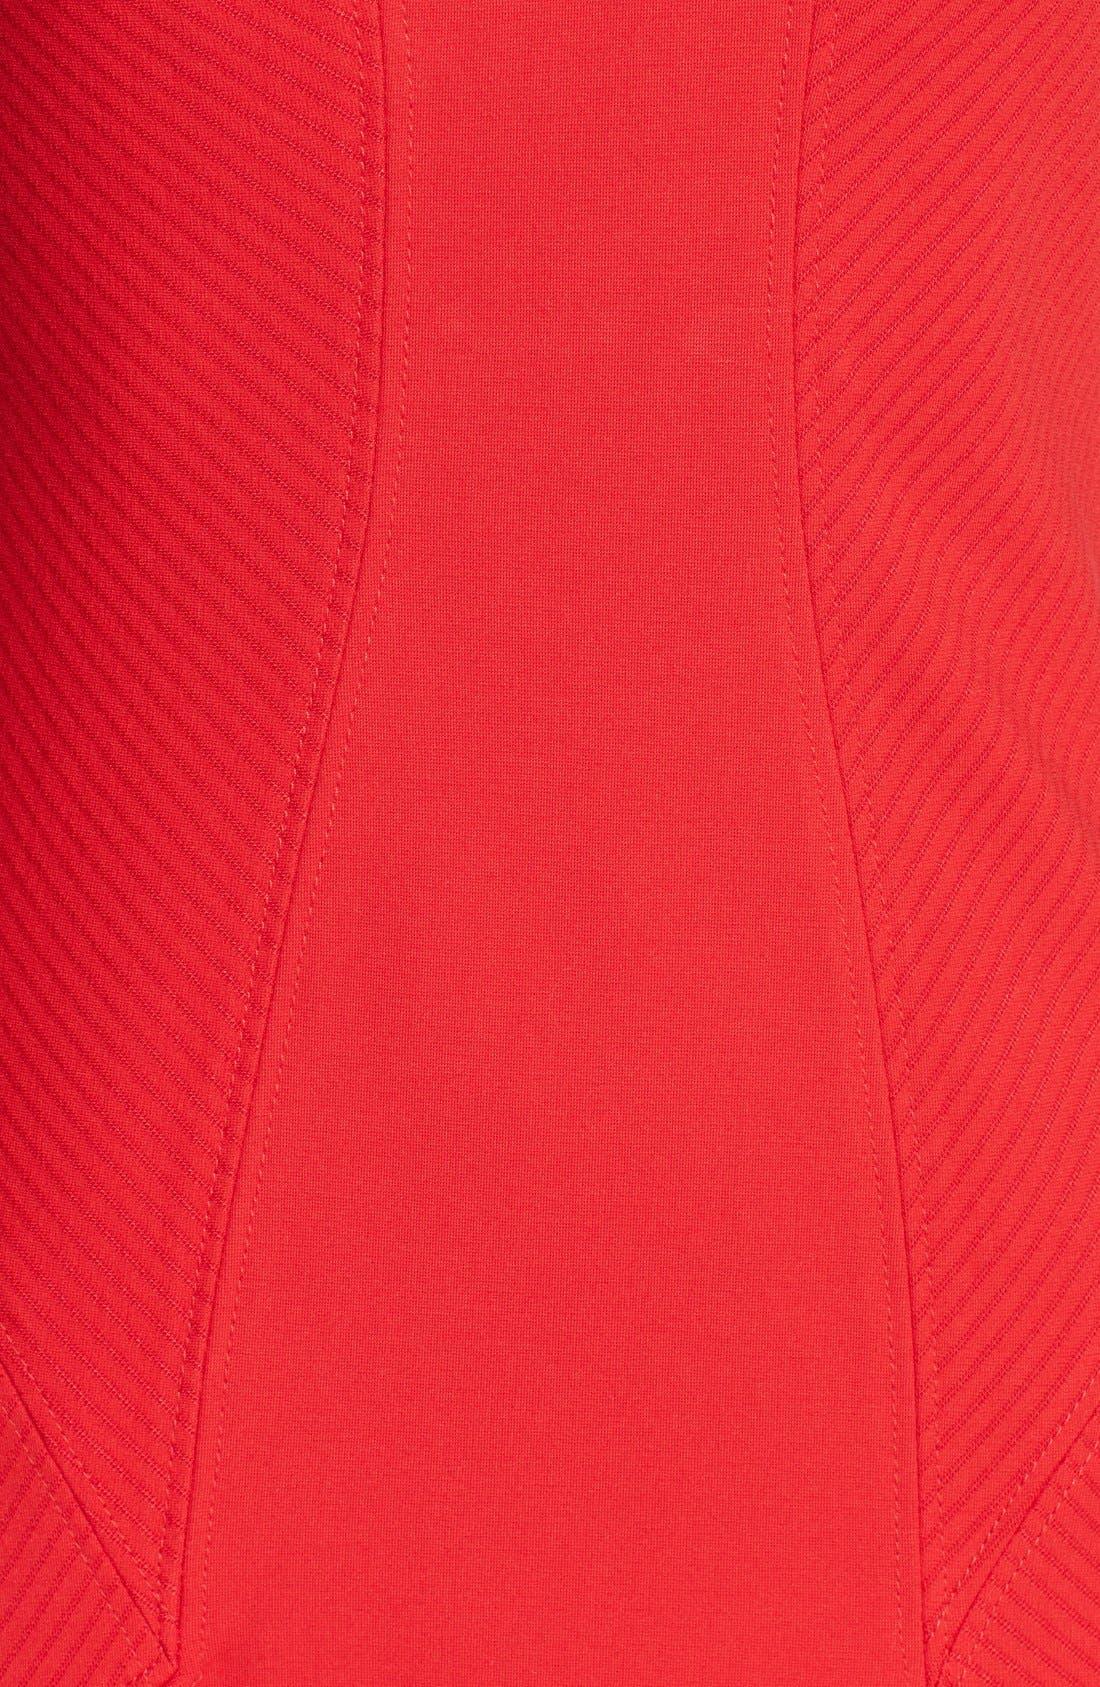 Alternate Image 3  - Diane von Furstenberg 'Carla' Knit Fit & Flare Dress